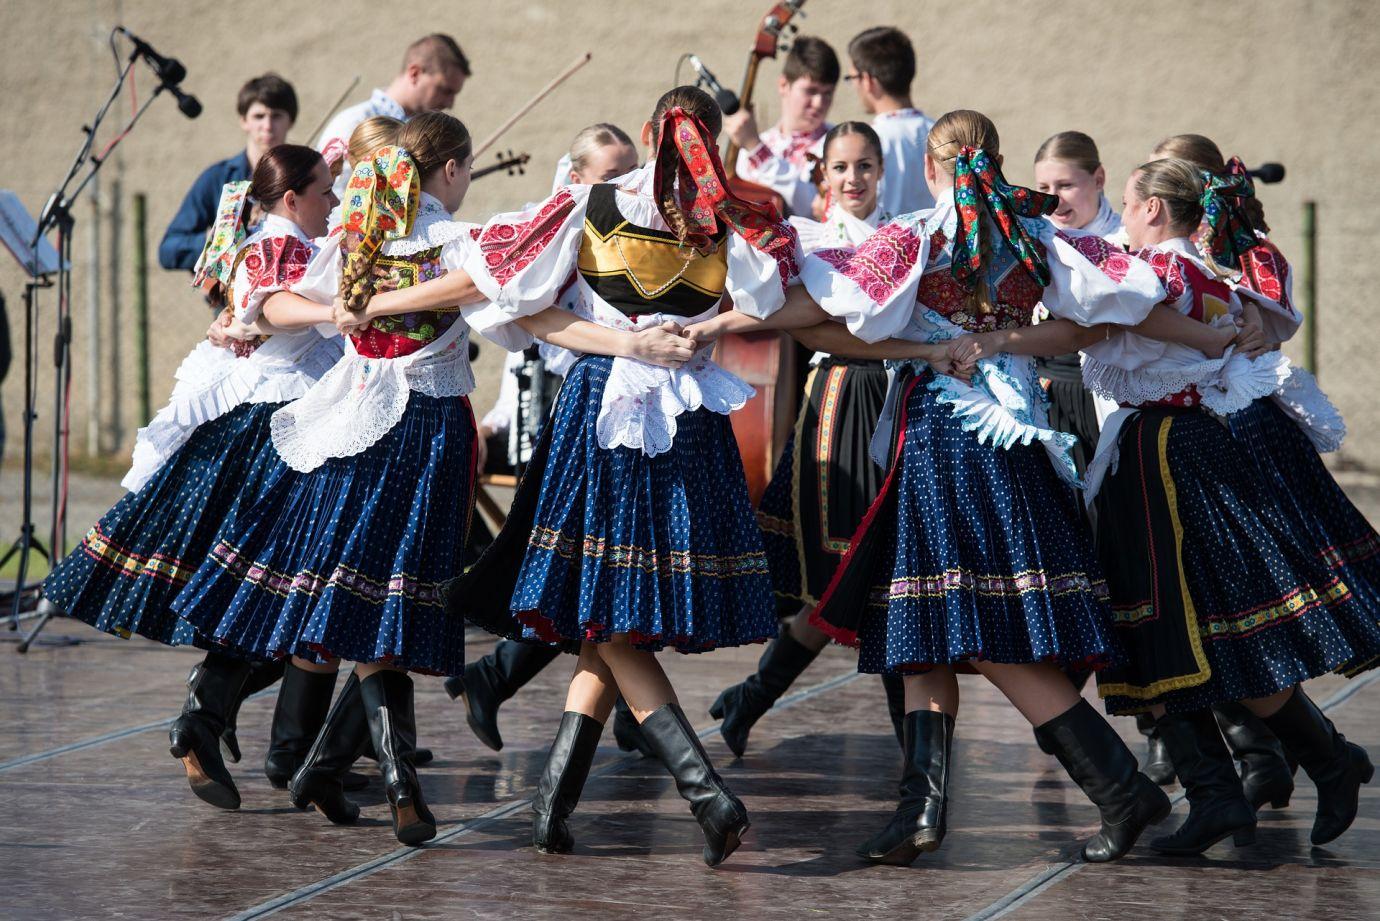 Tanzgruppe in Folklore